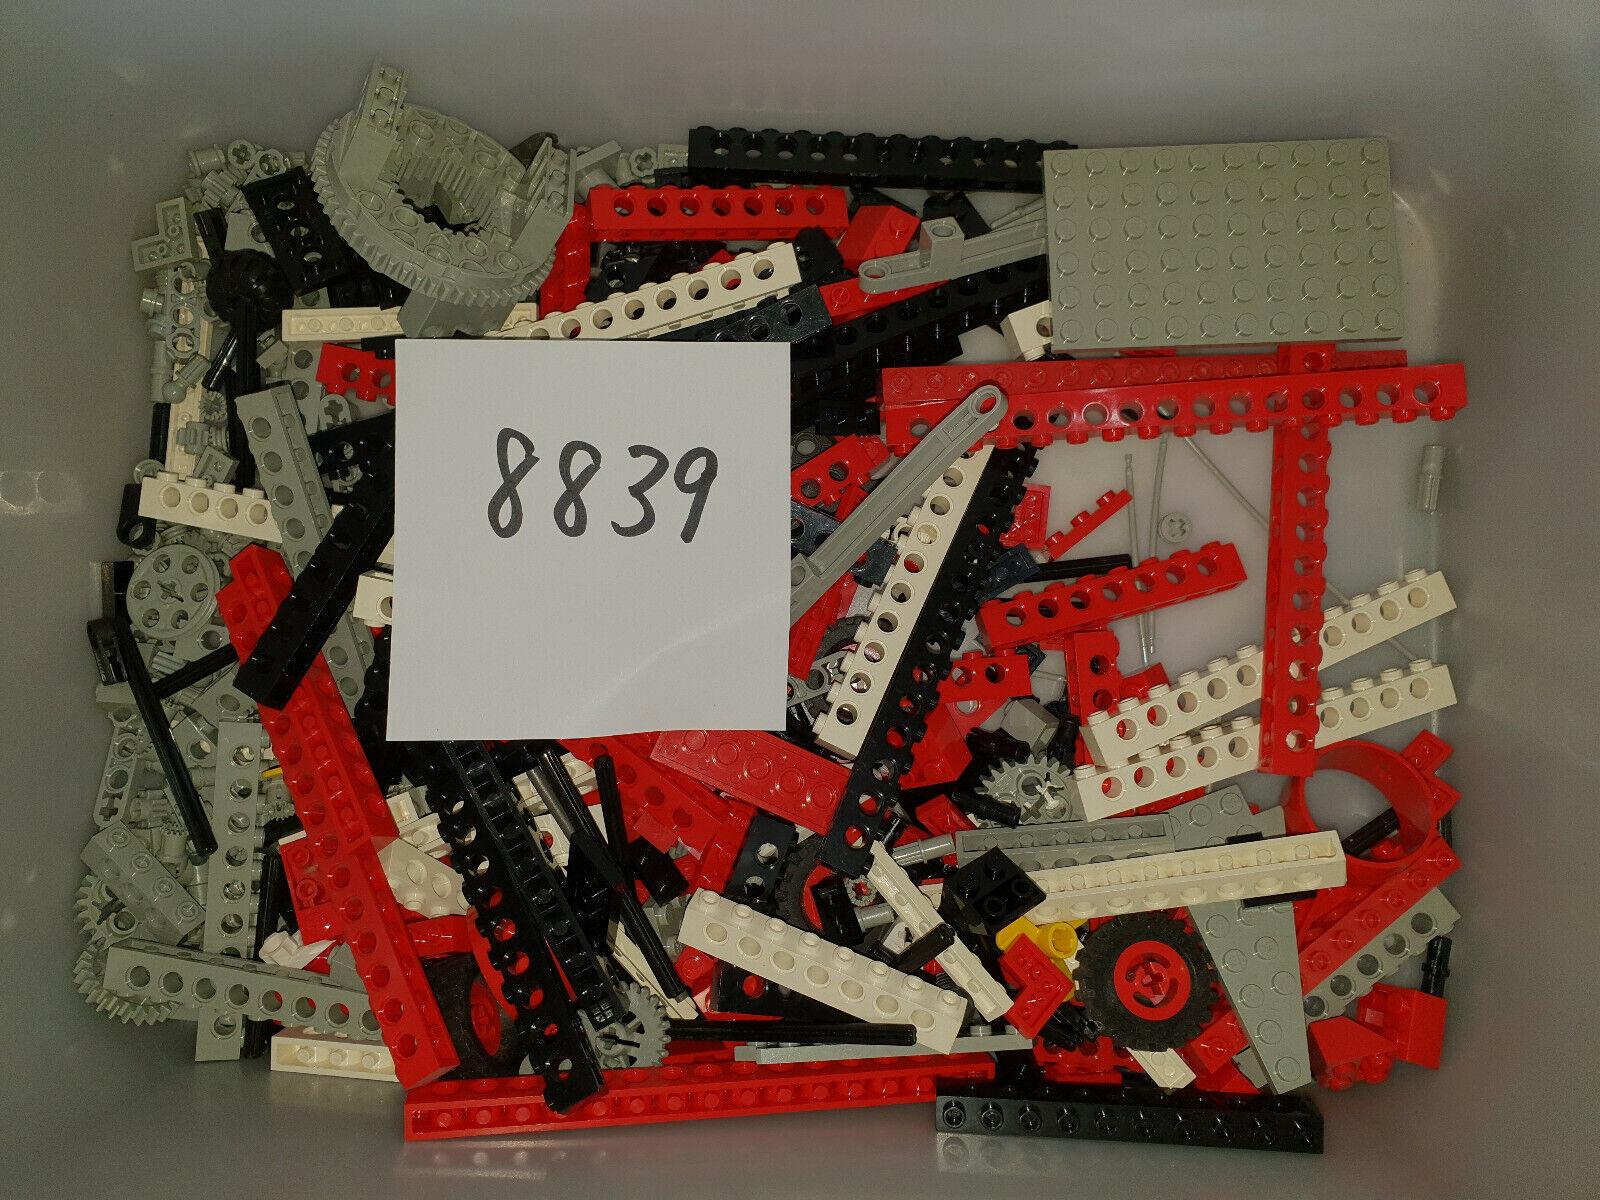 Lego Technic supply ship 8839